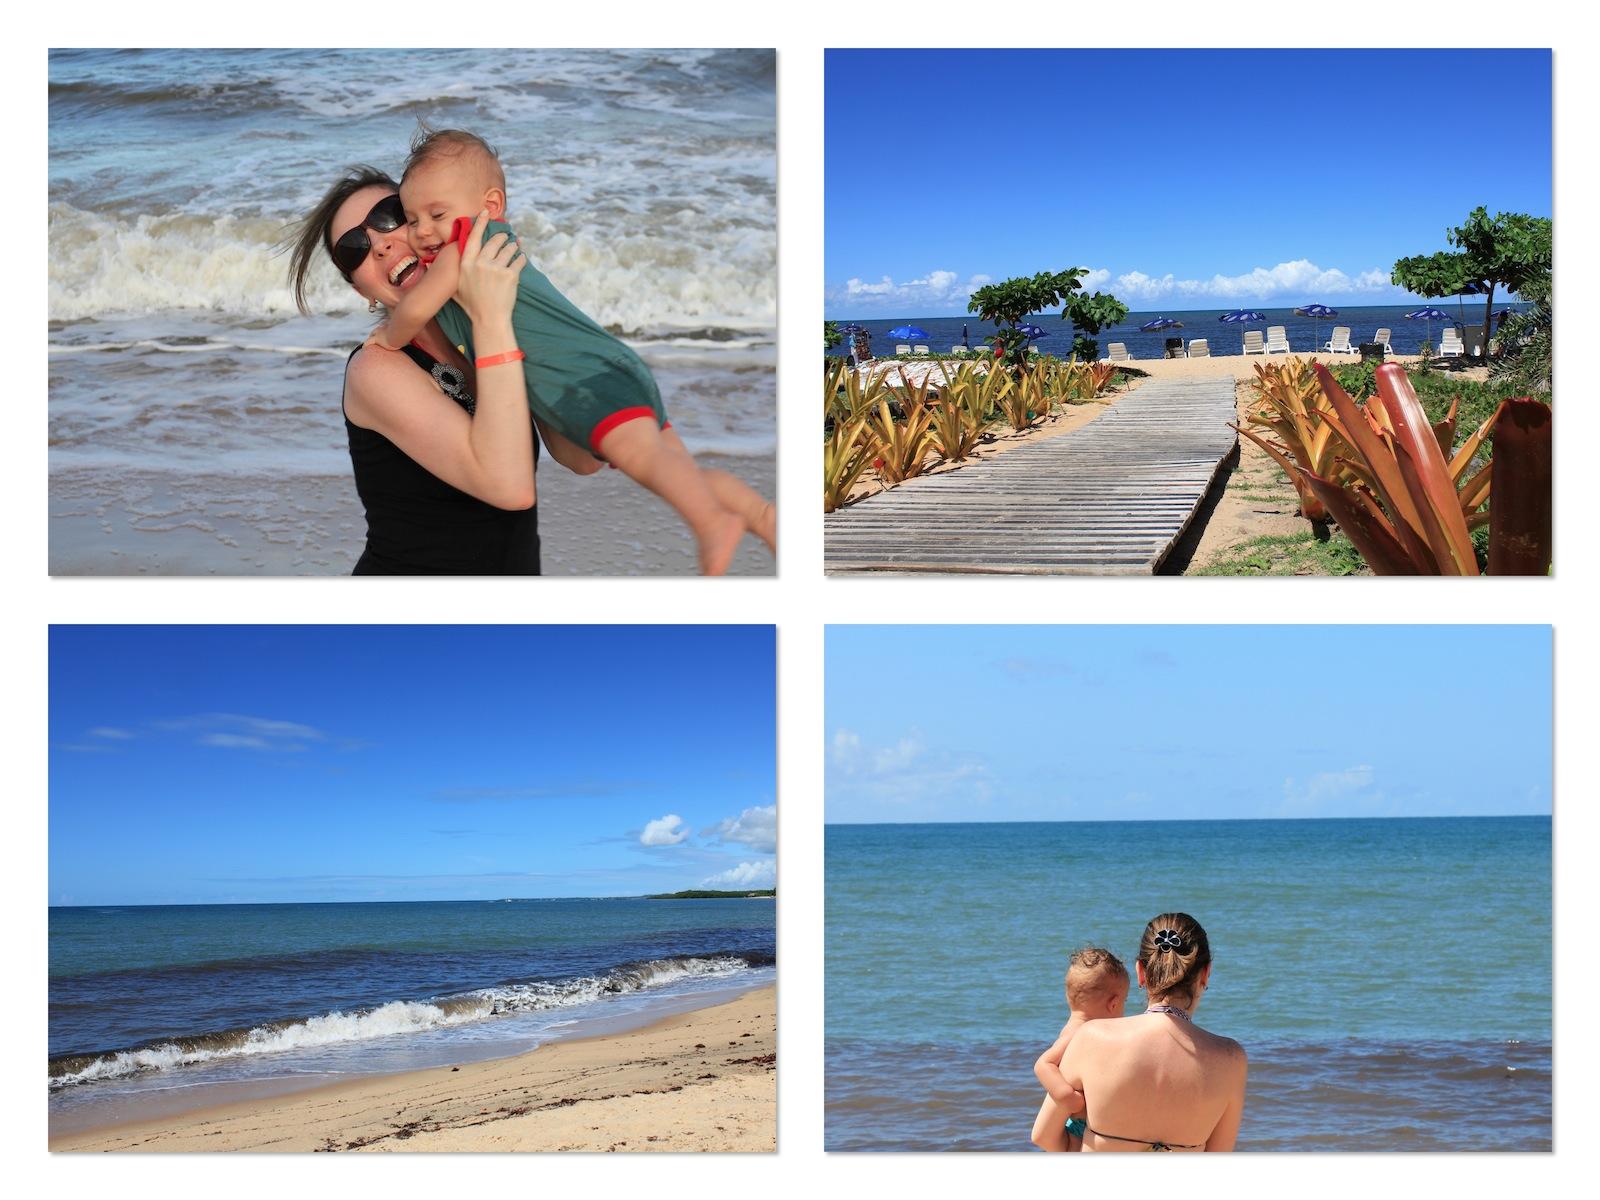 praia costa brasilis